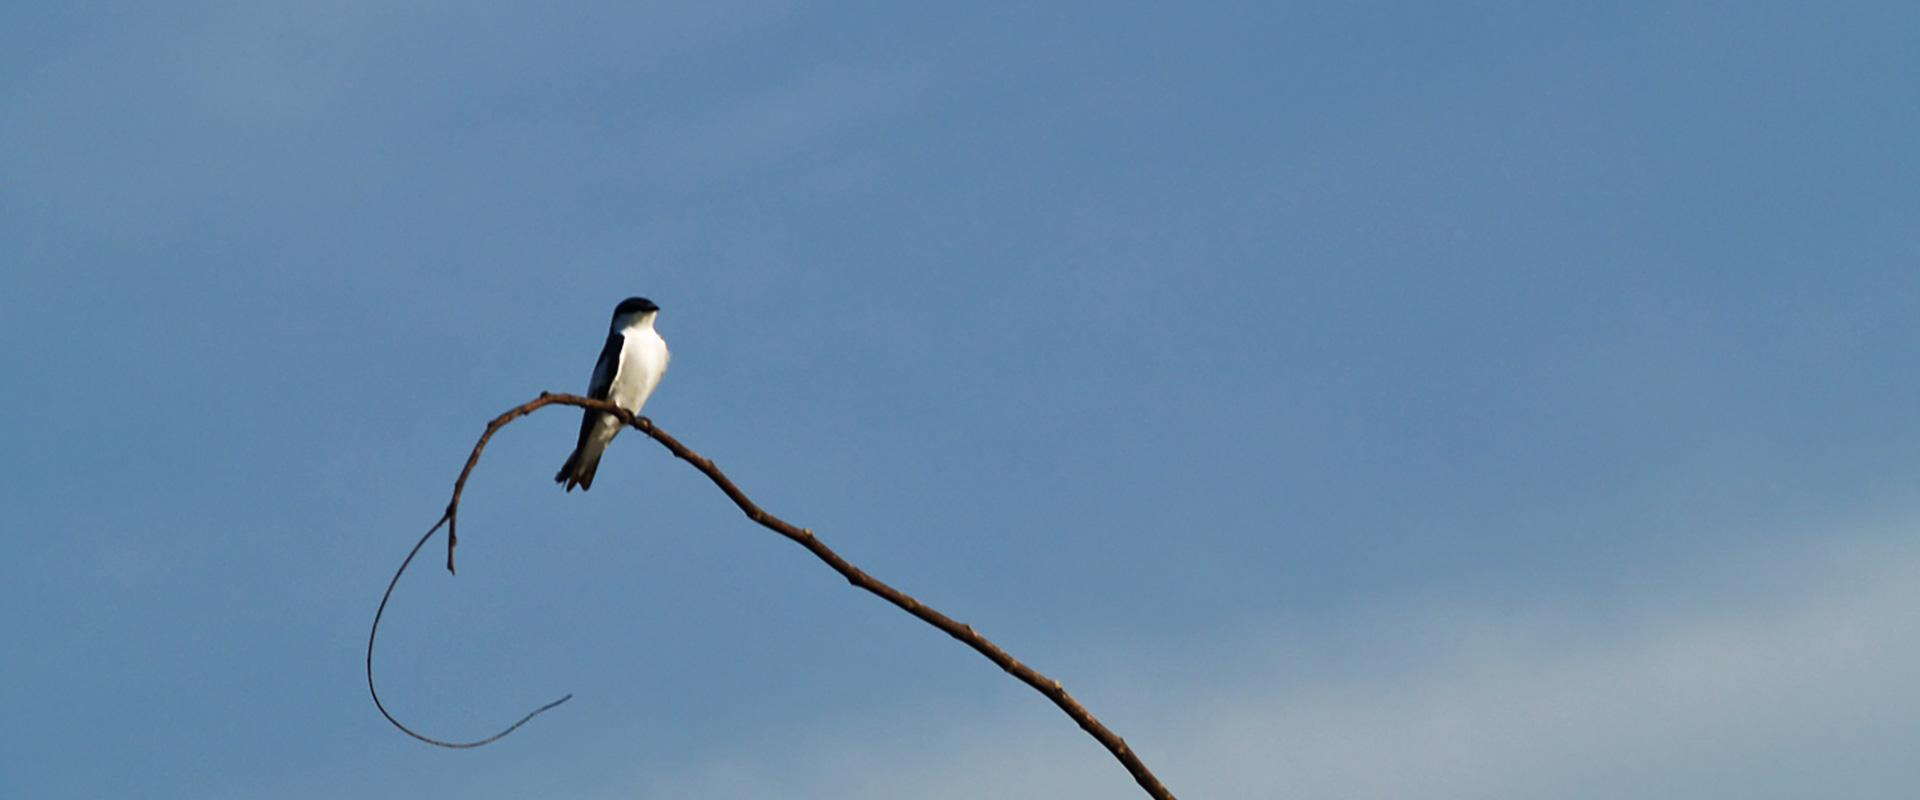 Kapawi Amazon Bird